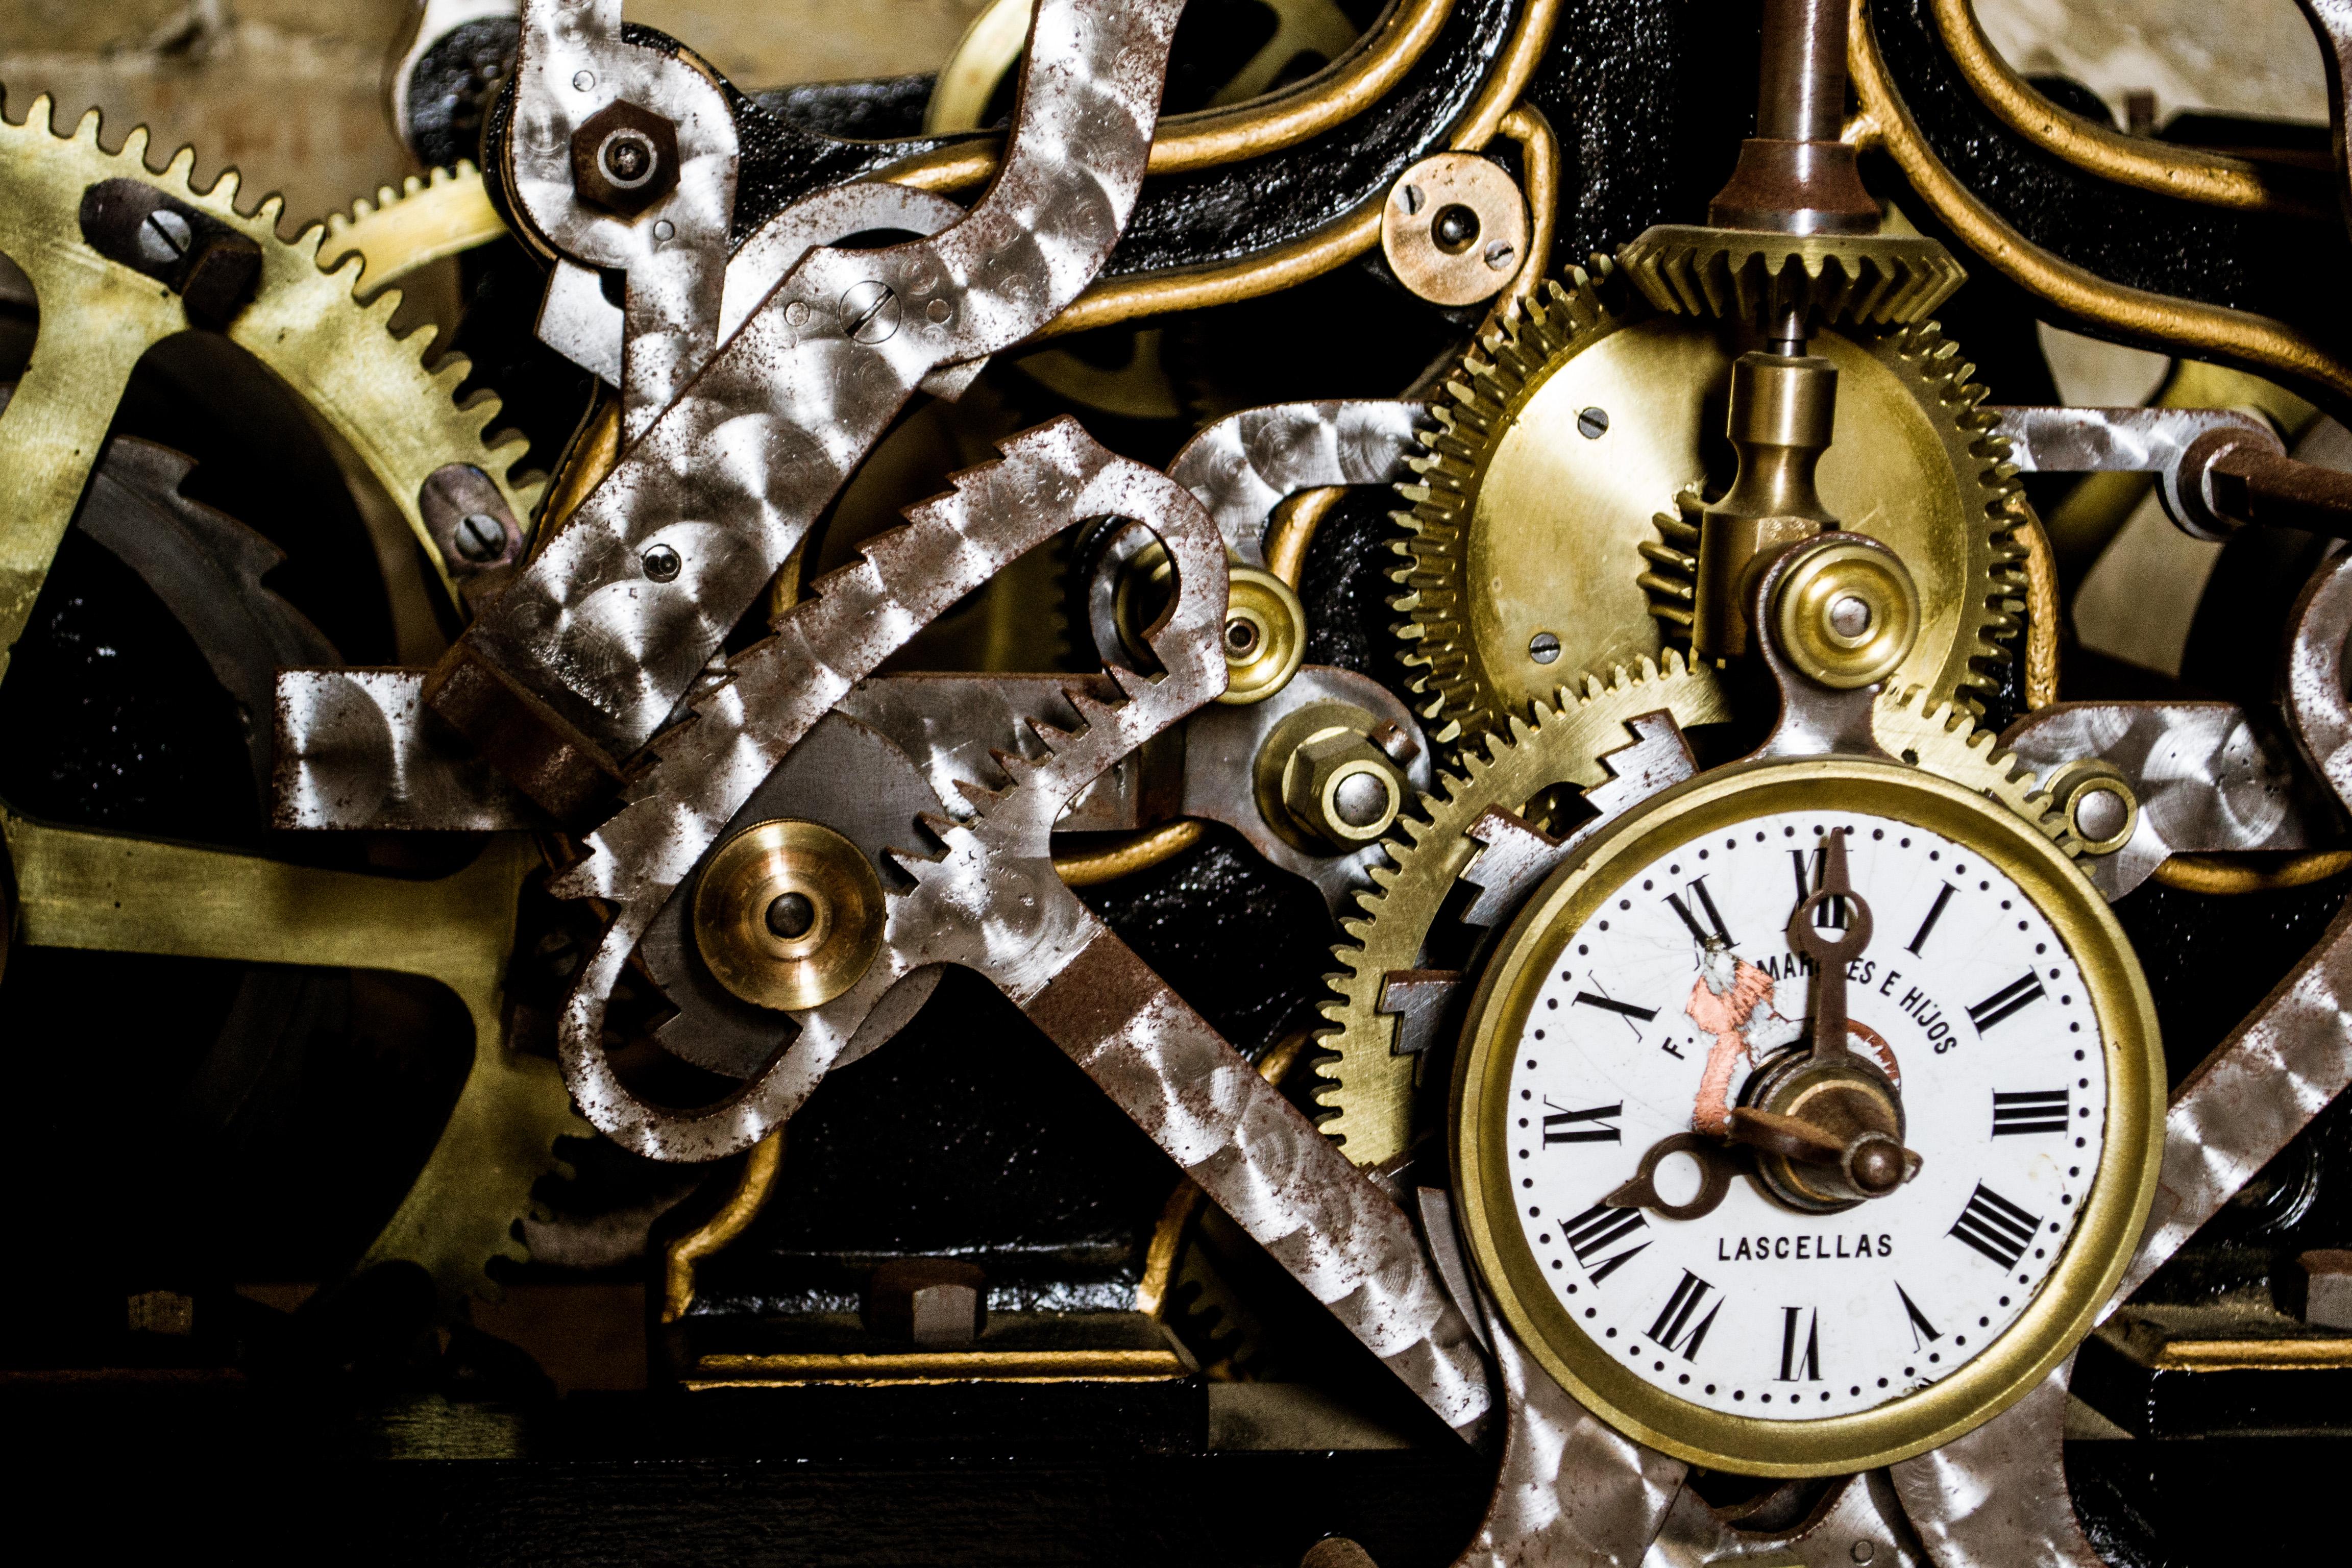 File mecanismo del wikimedia commons - Mecanismo para reloj de pared ...